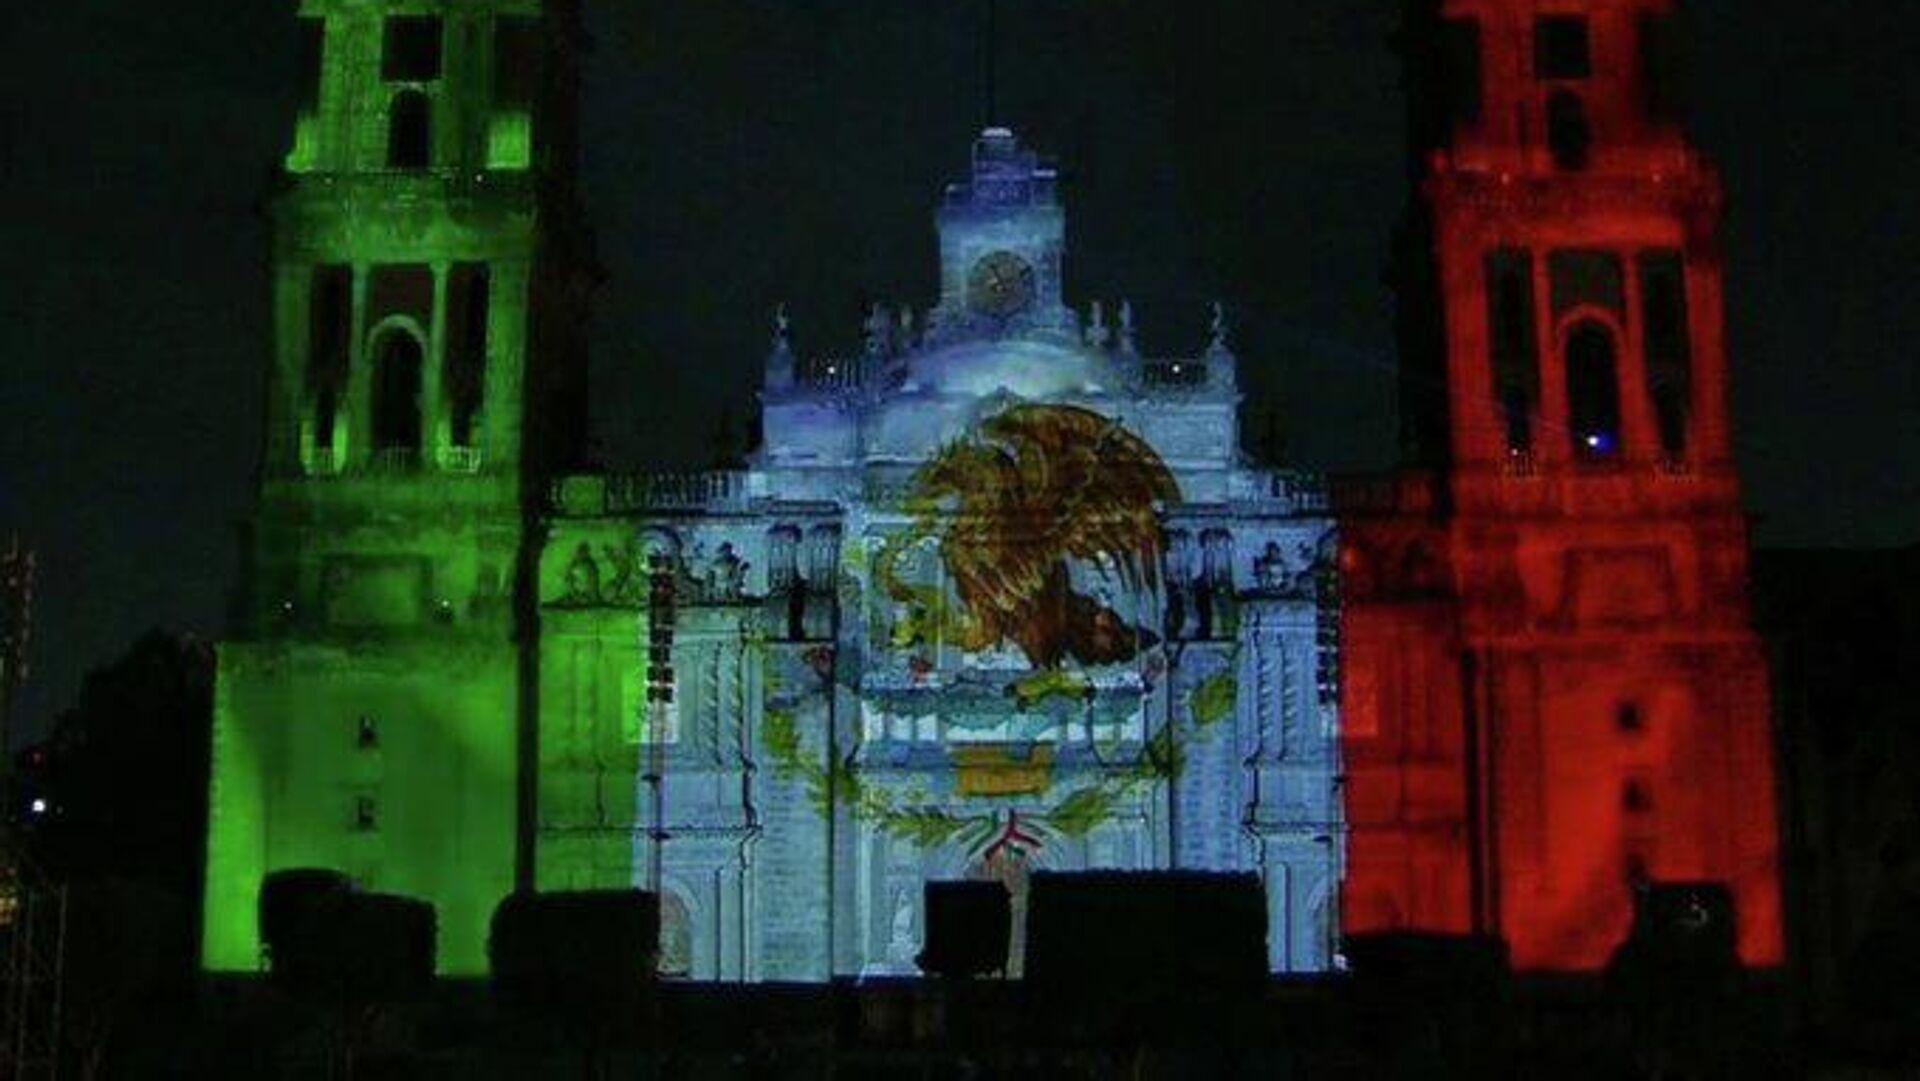 Catedral Metropolitana de la Ciudad de México - Sputnik Mundo, 1920, 27.09.2021